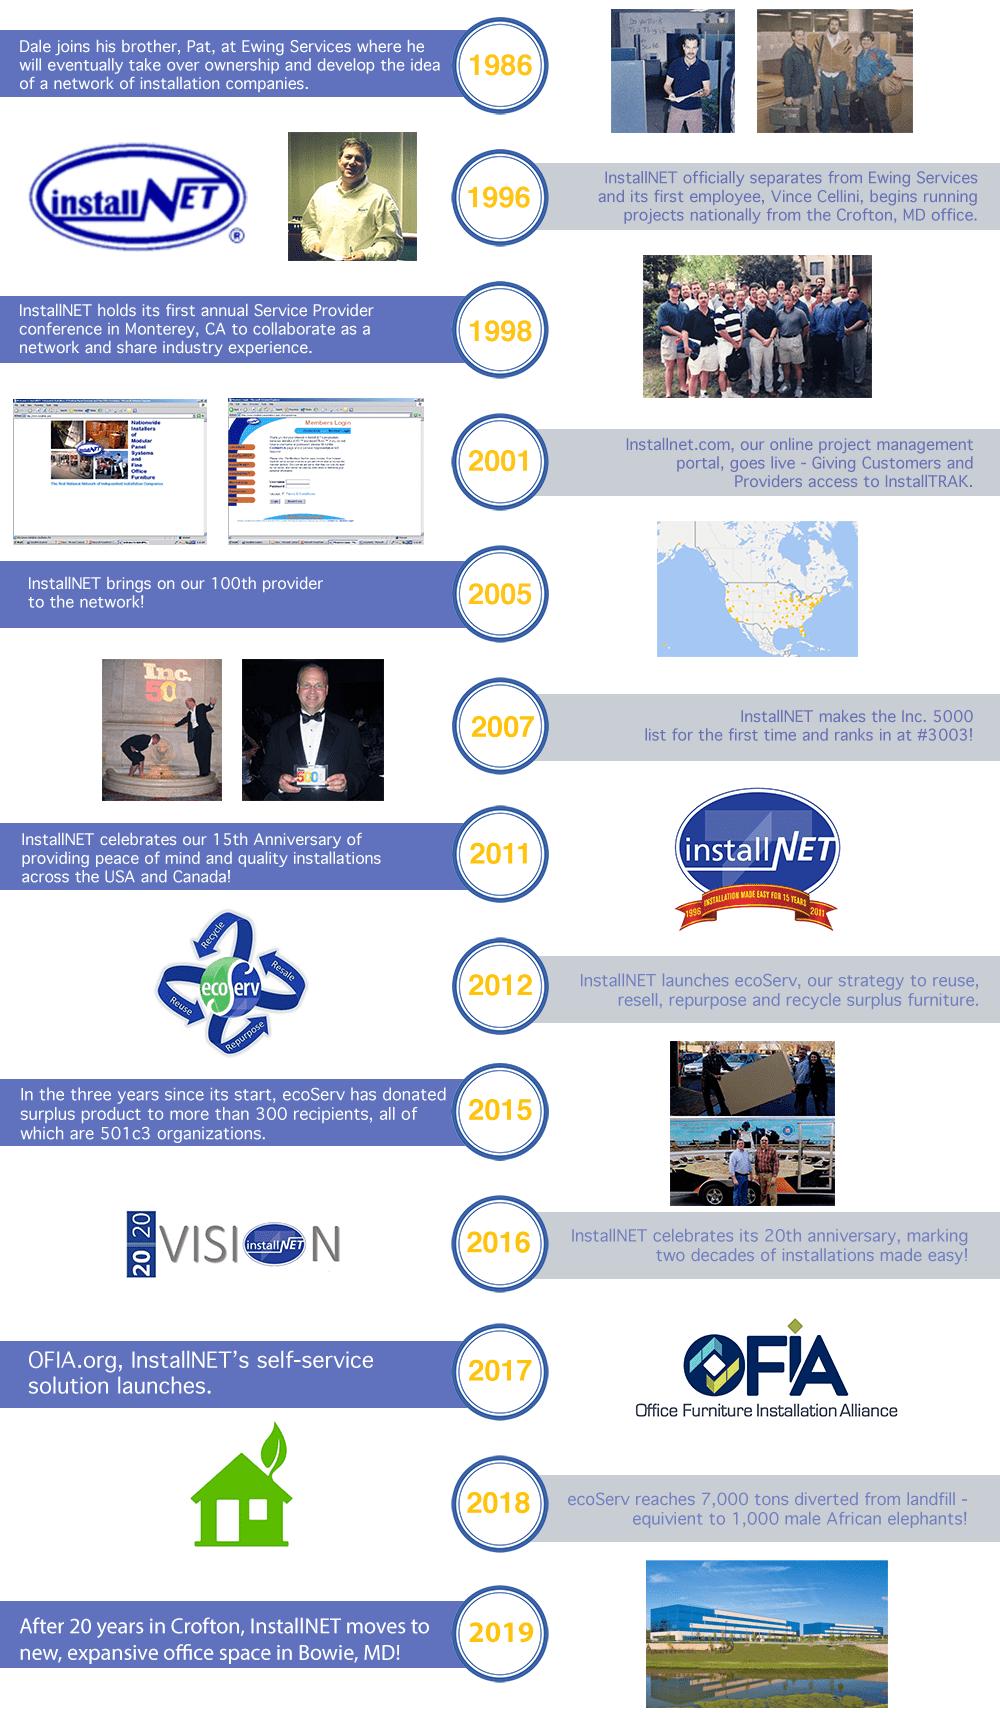 InstallNET history timeline 1986-2019